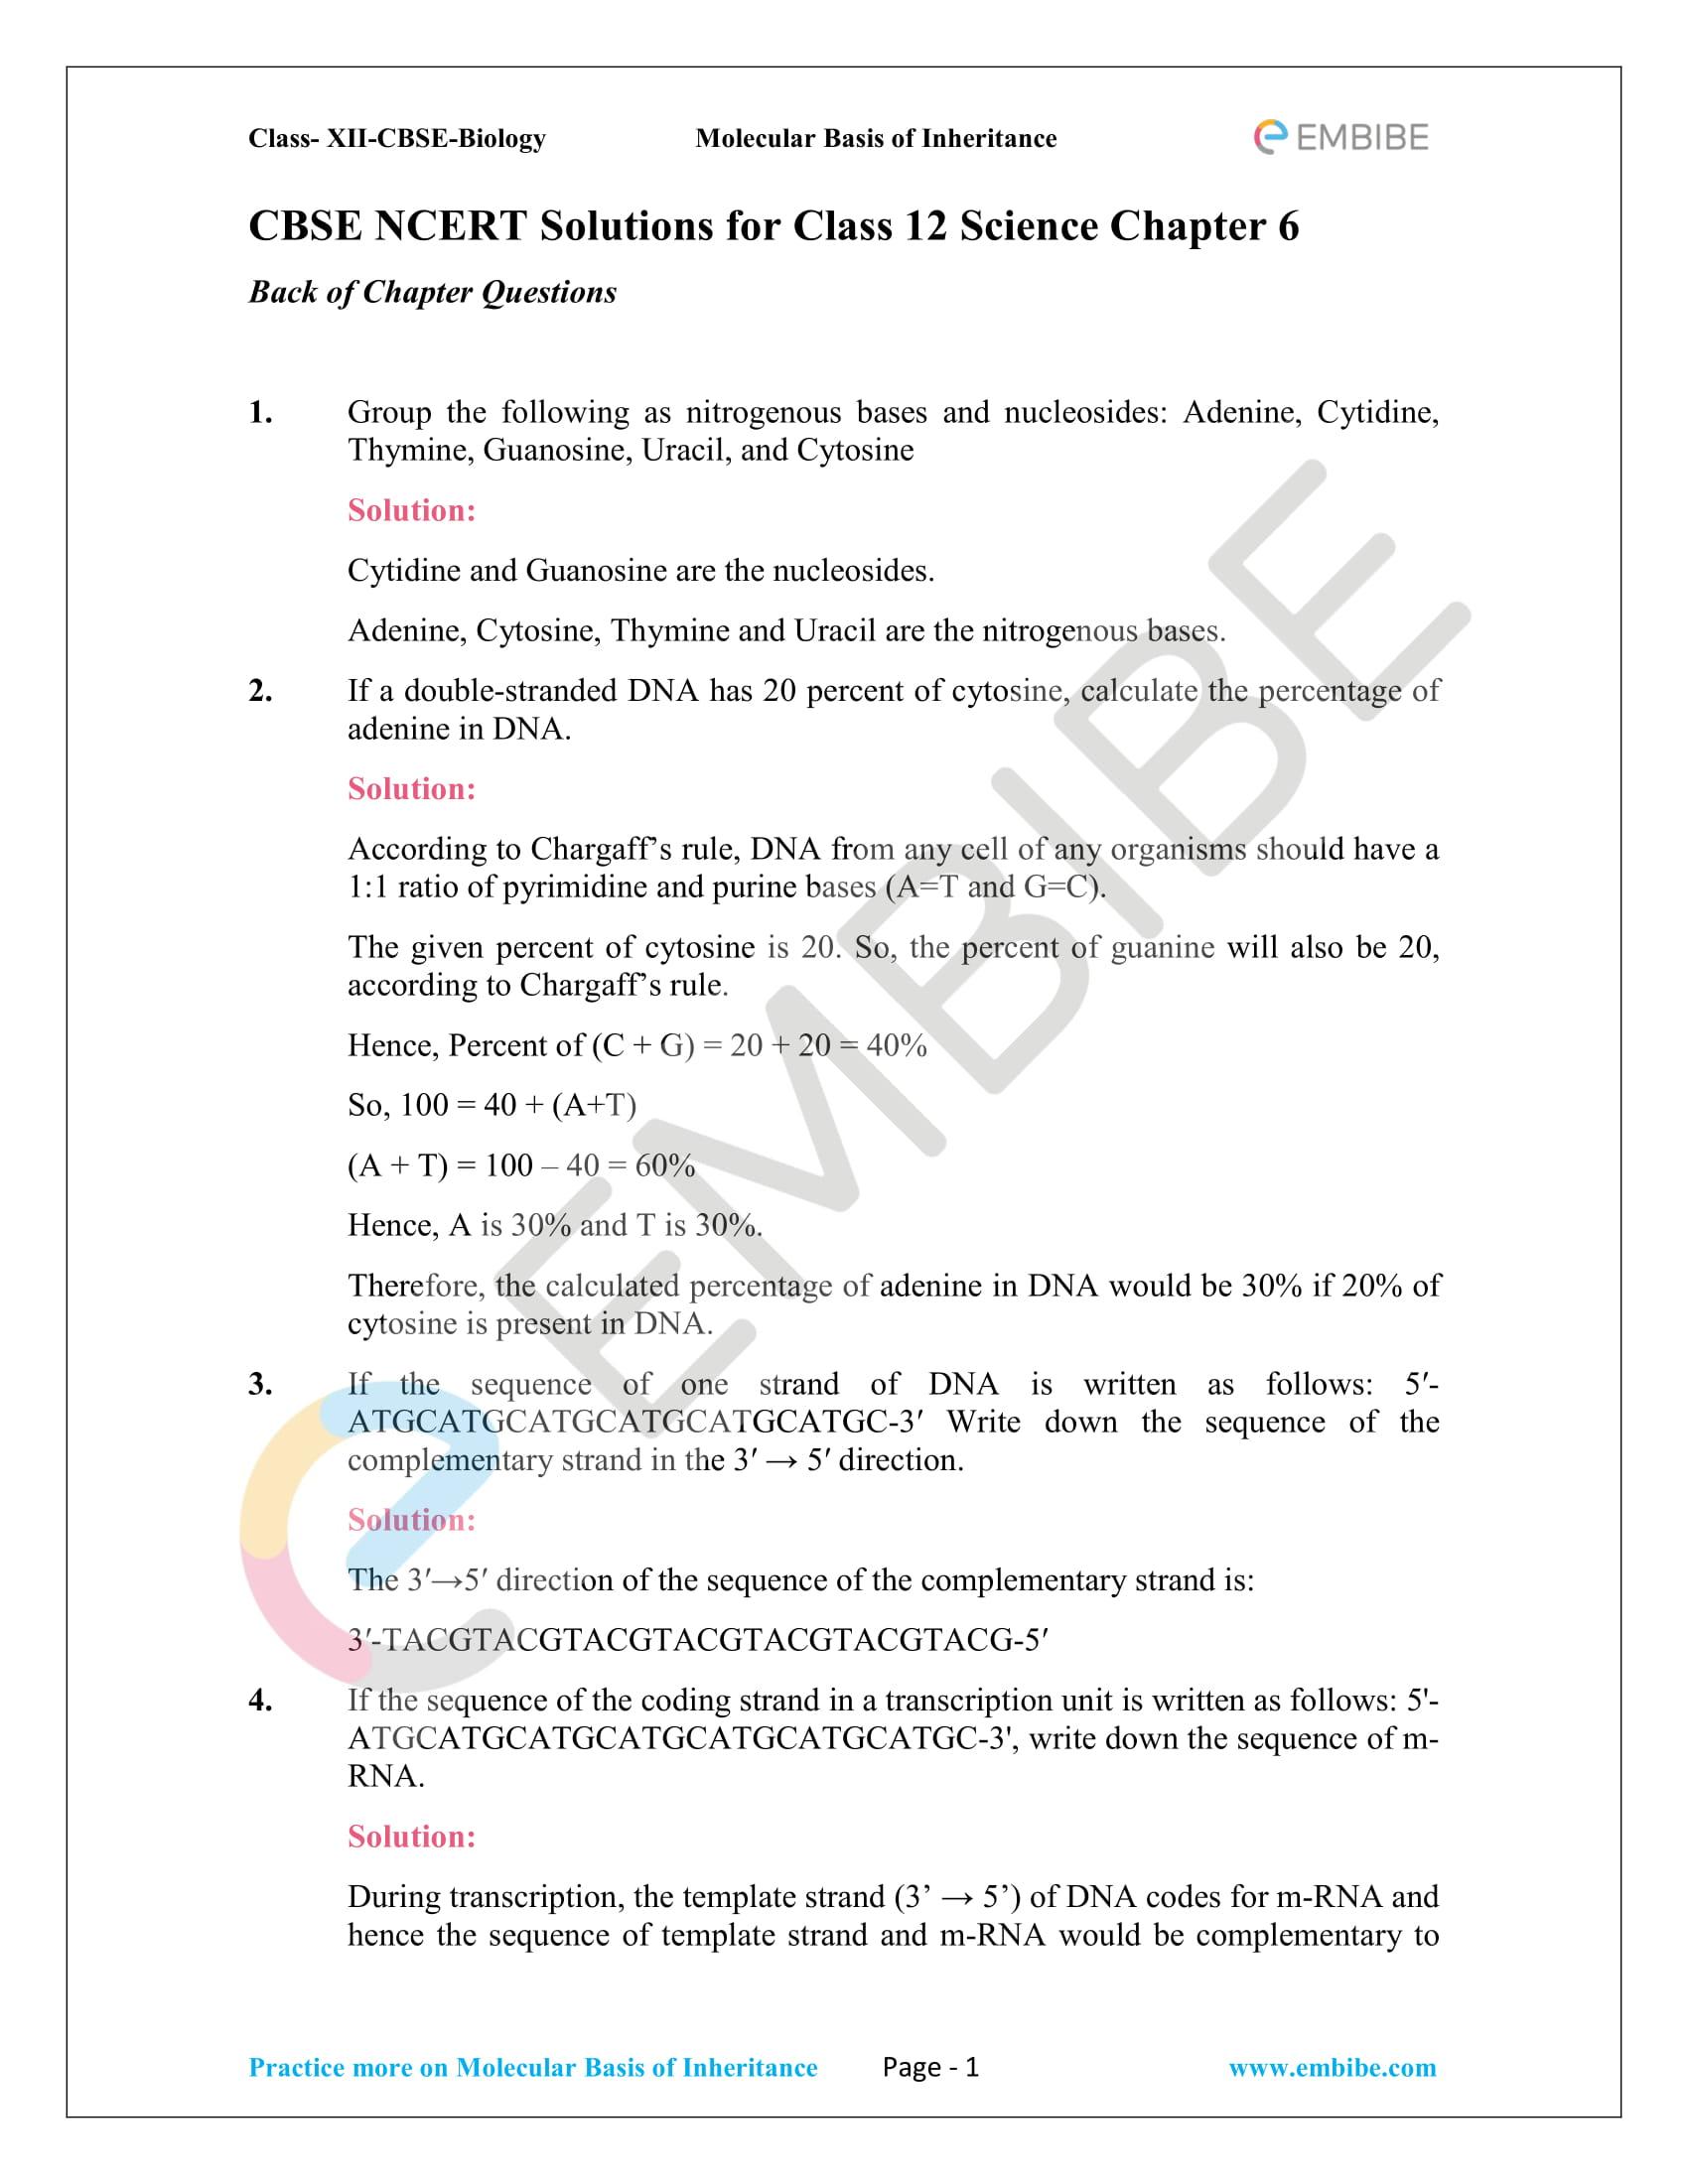 NCERT Solutions for Class 12 Biology Chapter 6: Molecular Basis Of Inheritance - 1